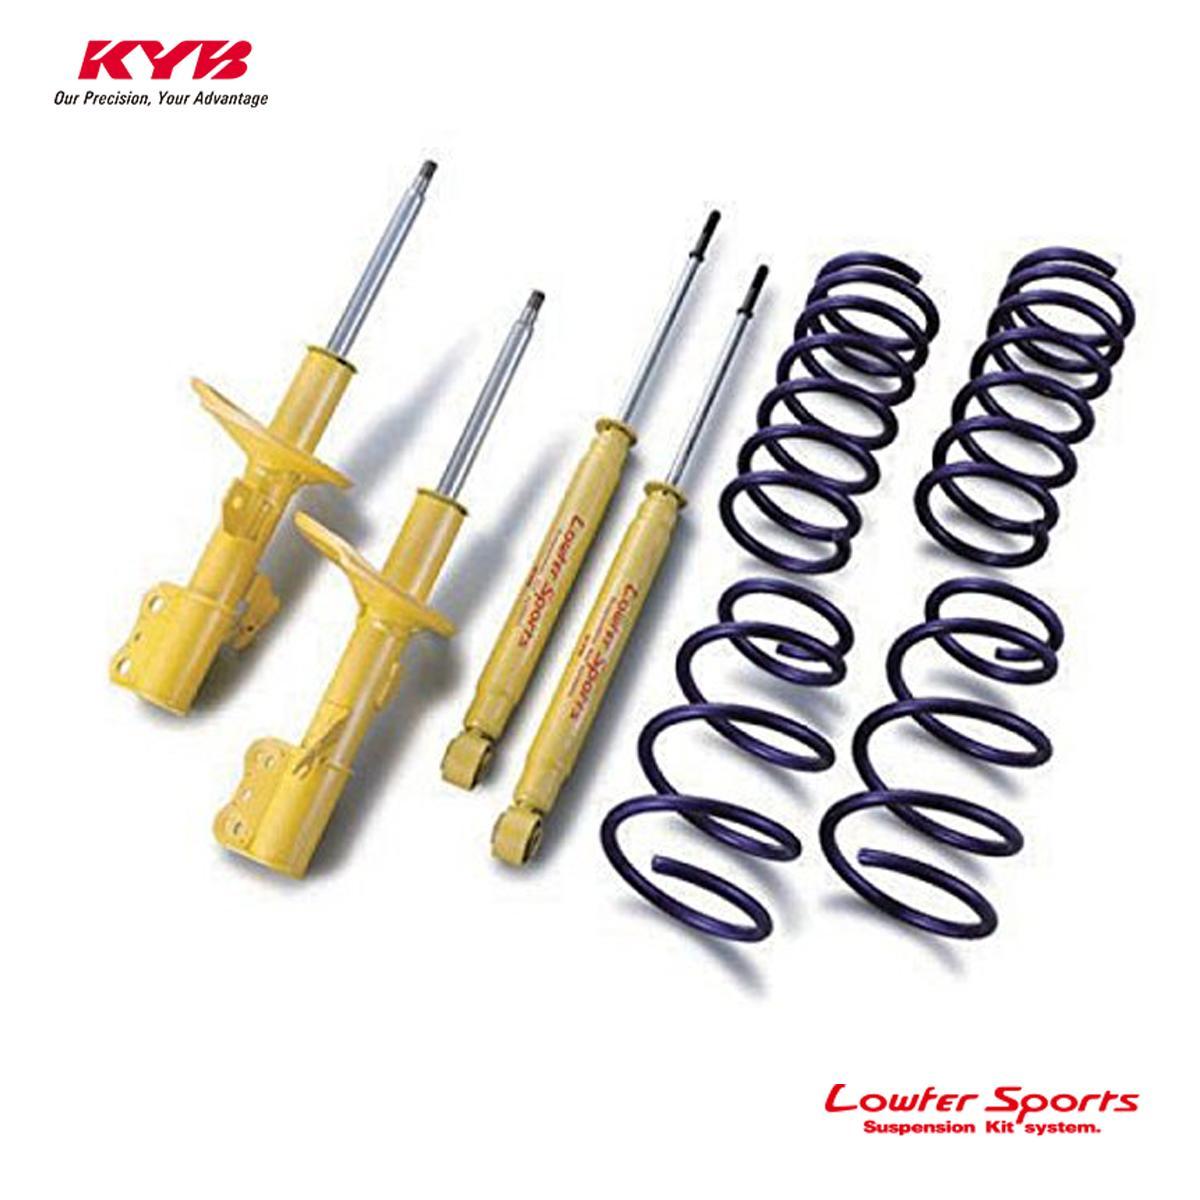 KYB カヤバ SX4 YA11S ショックアブソーバー サスペンションキット Lowfer Sports LKIT-YA11S 配送先条件有り